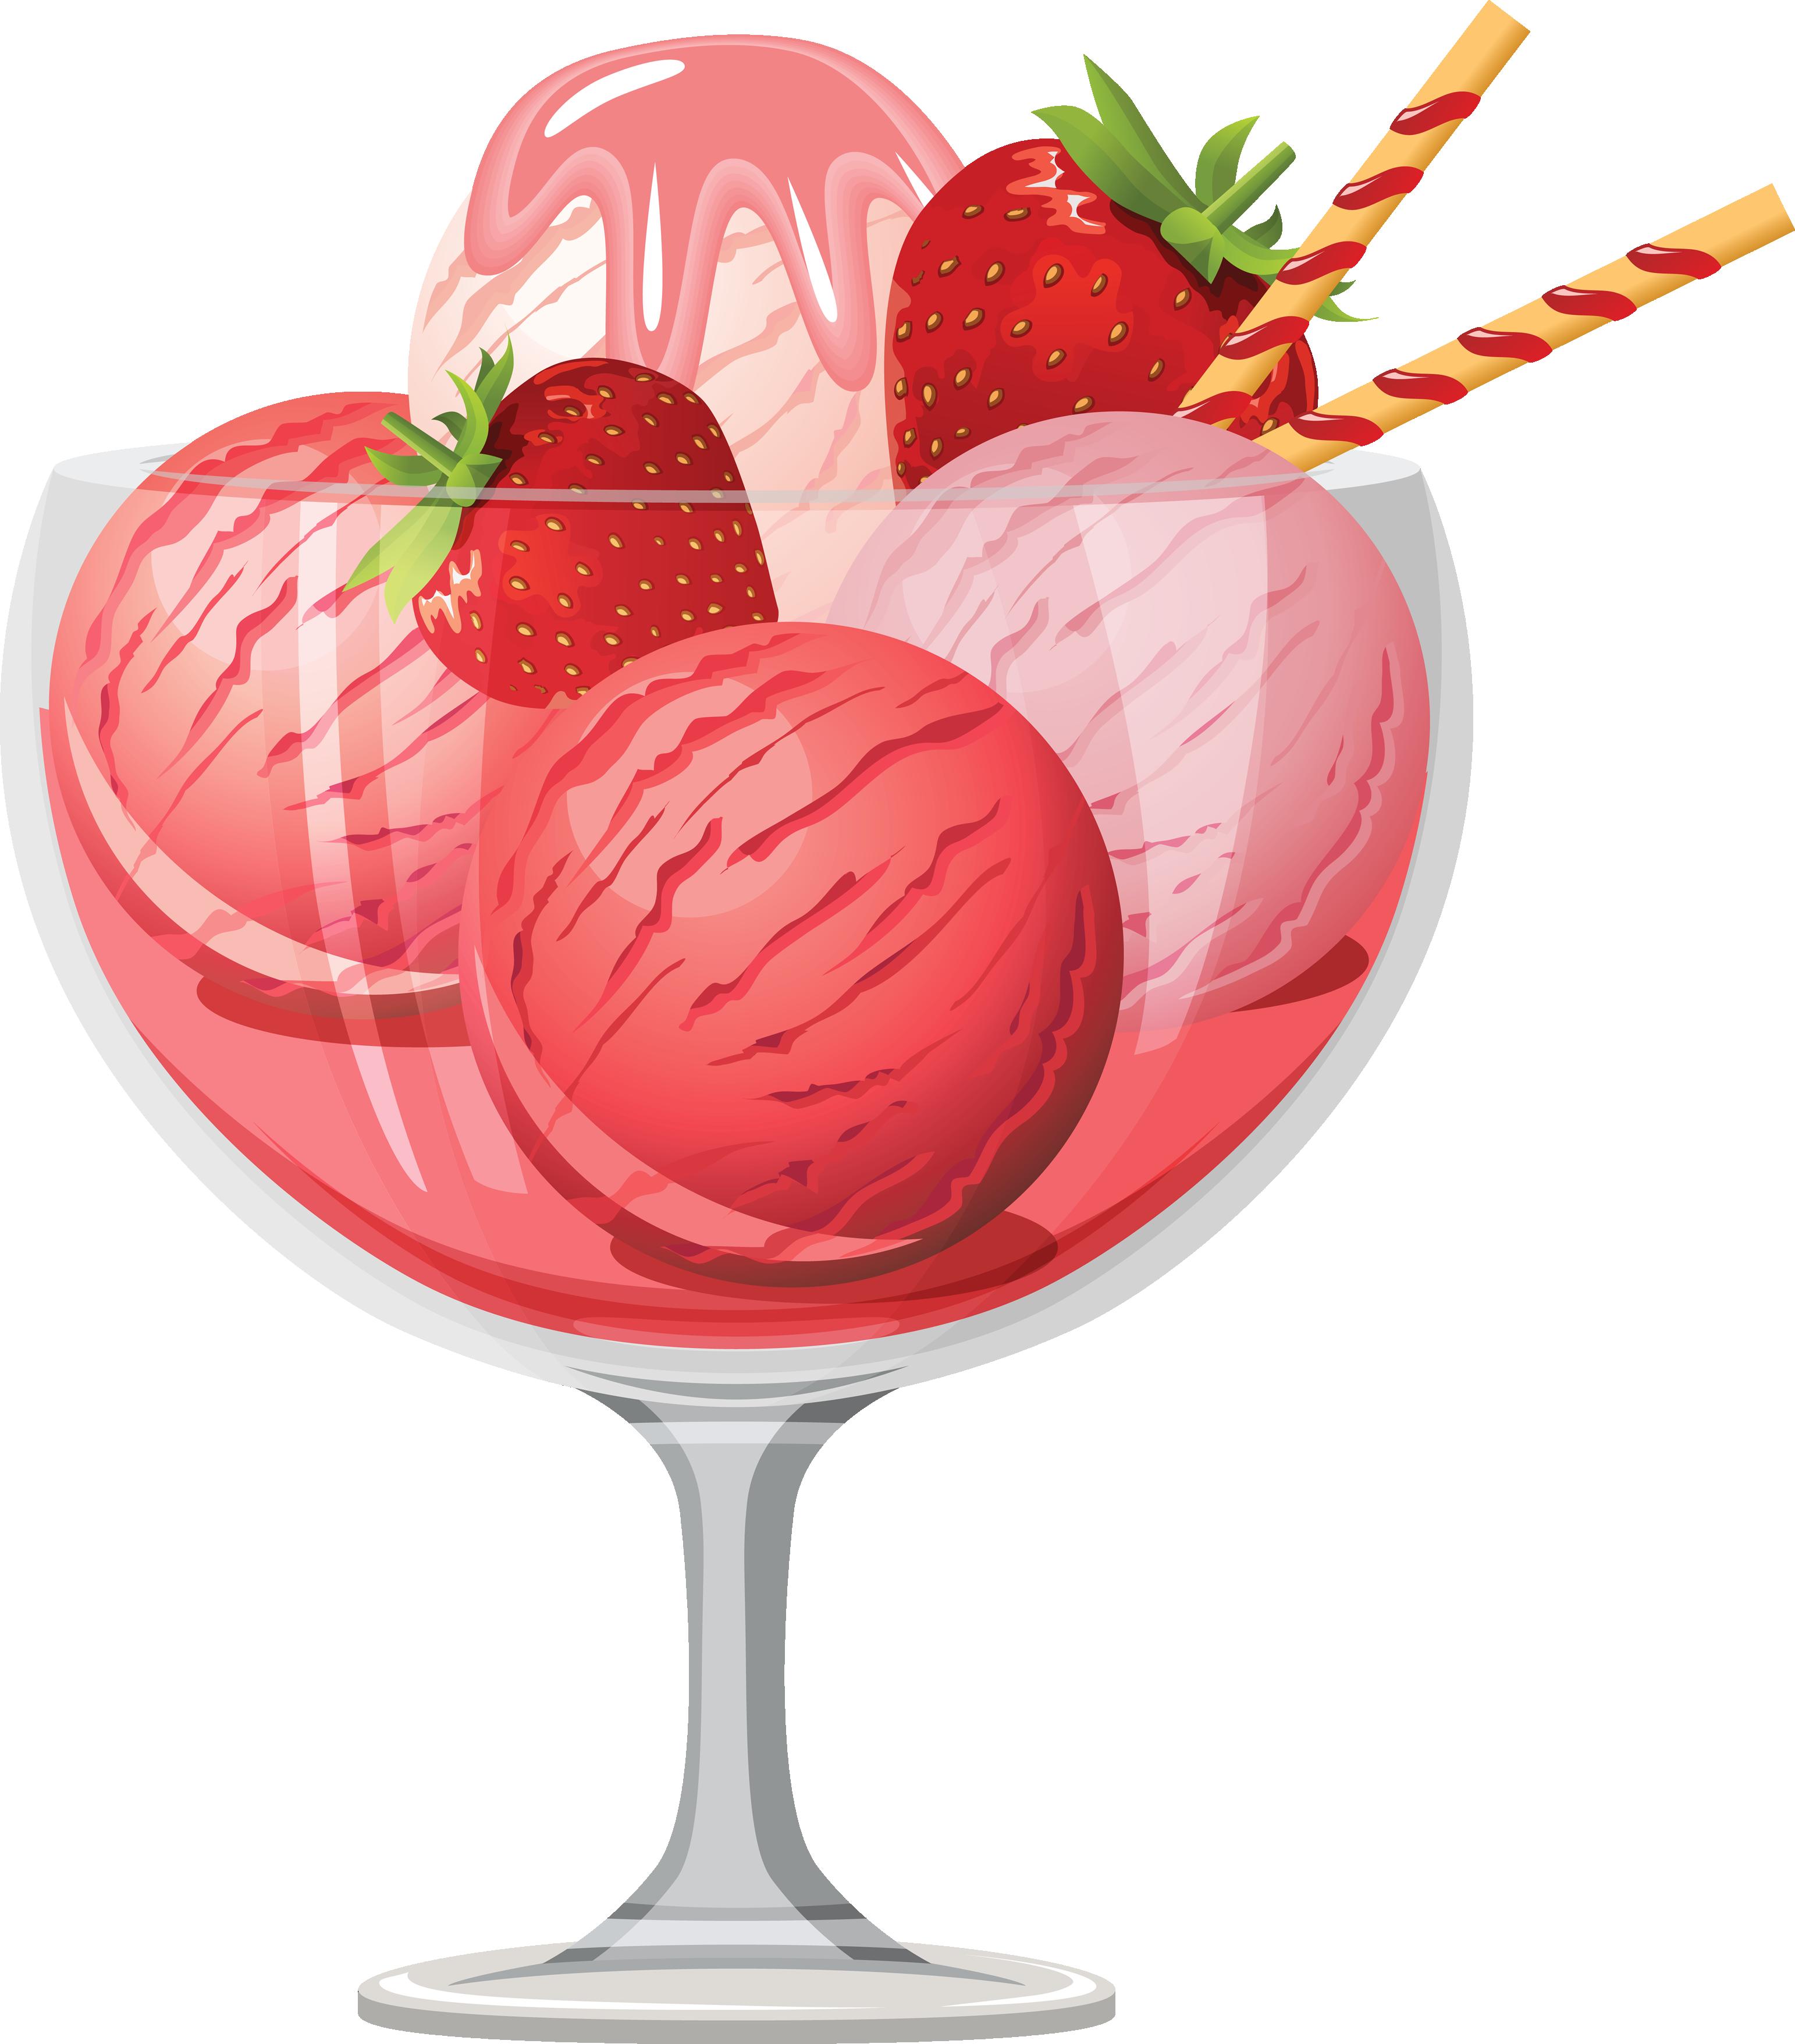 Ice cream png image. Desserts clipart dessert buffet